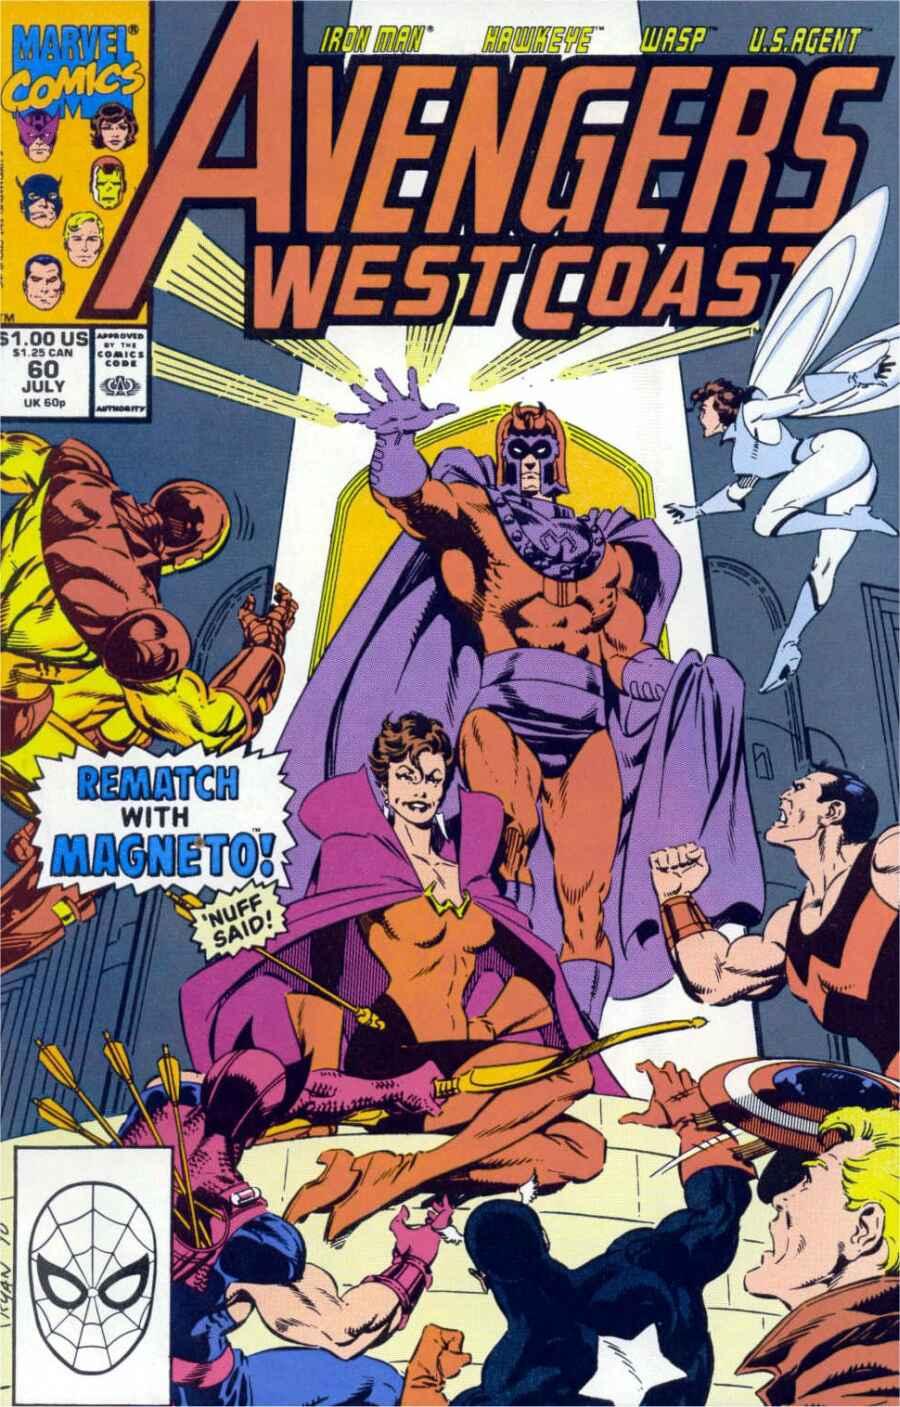 Avengers West Coast (1989) 60 Page 1